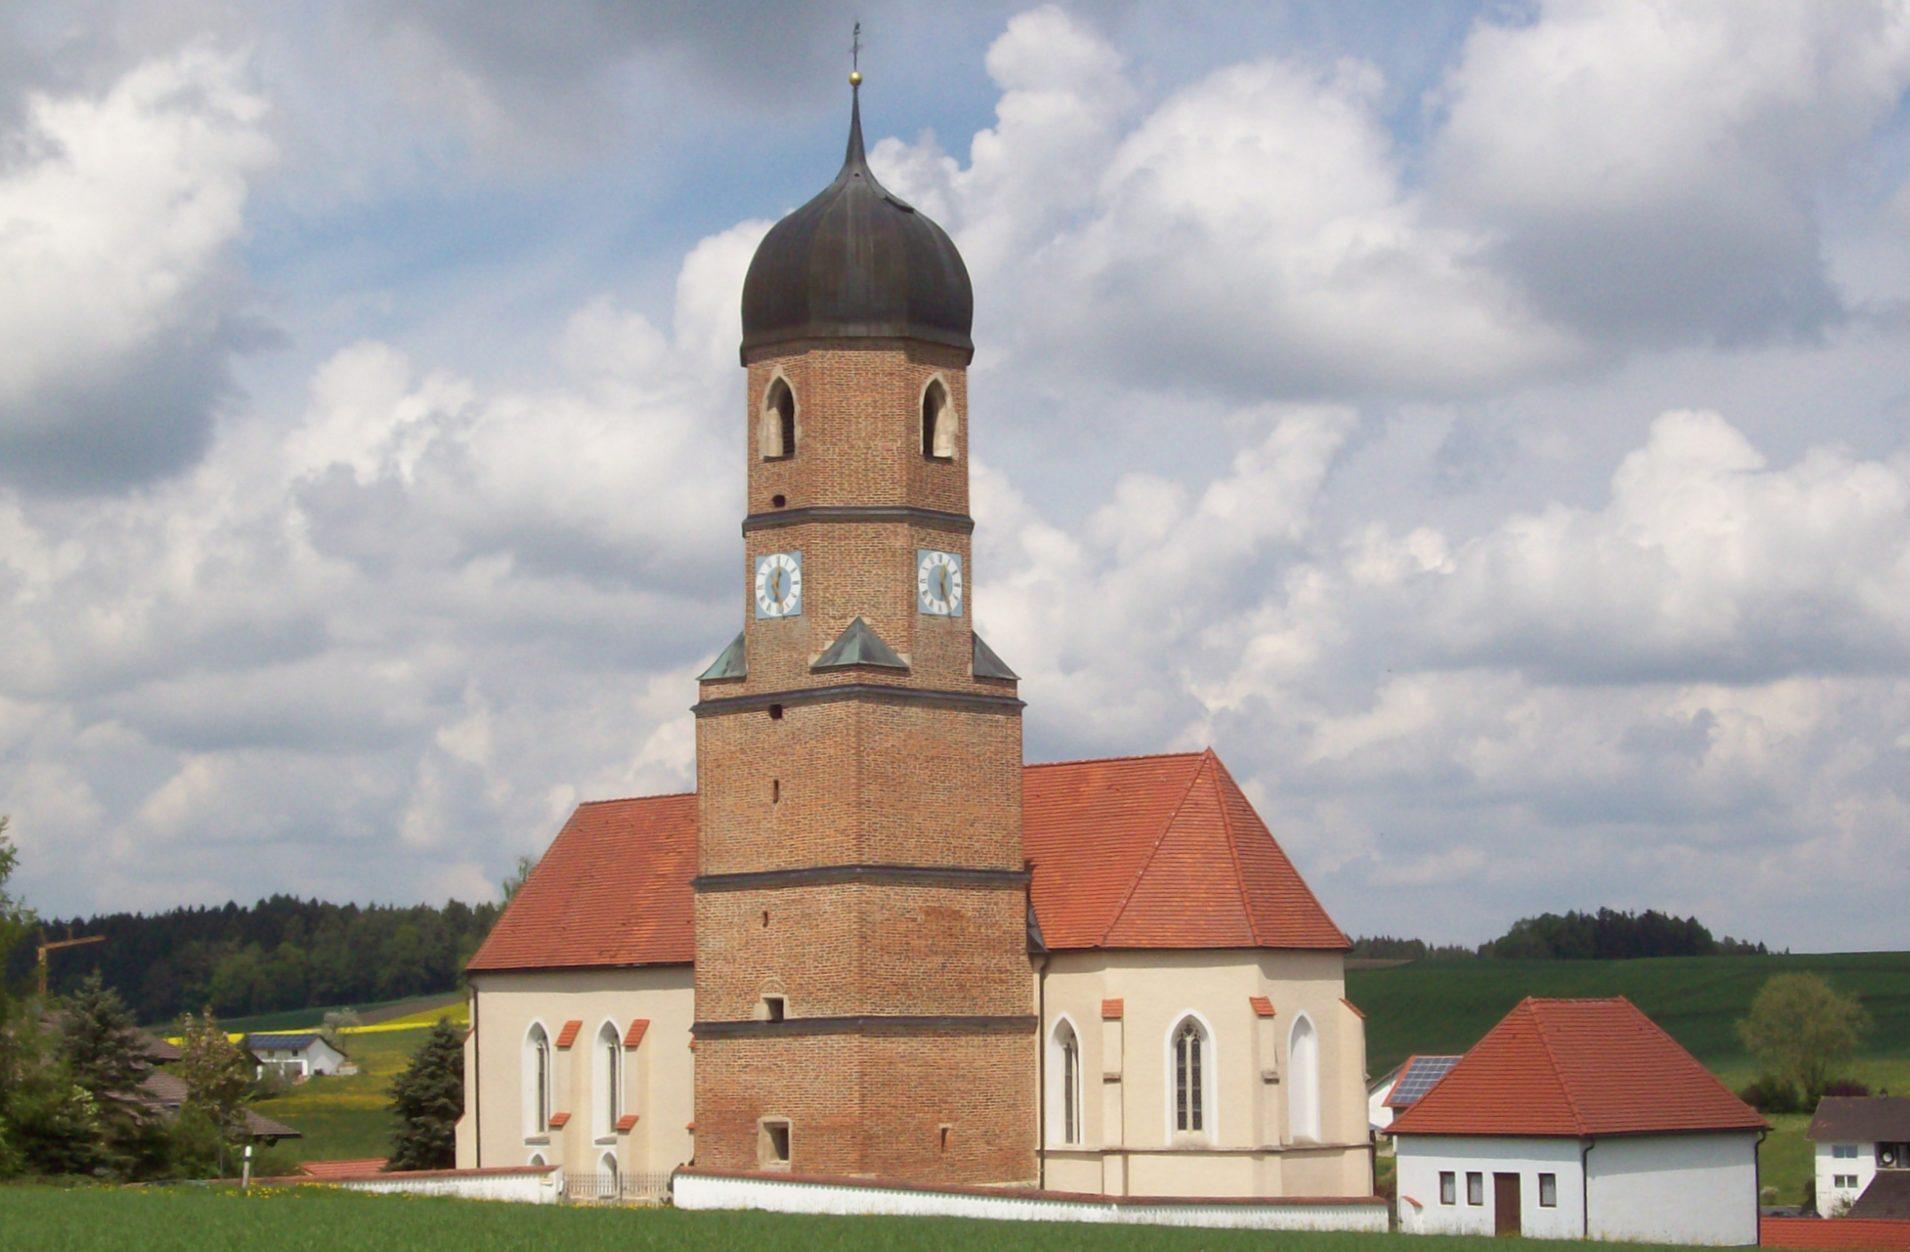 Martinskirchen